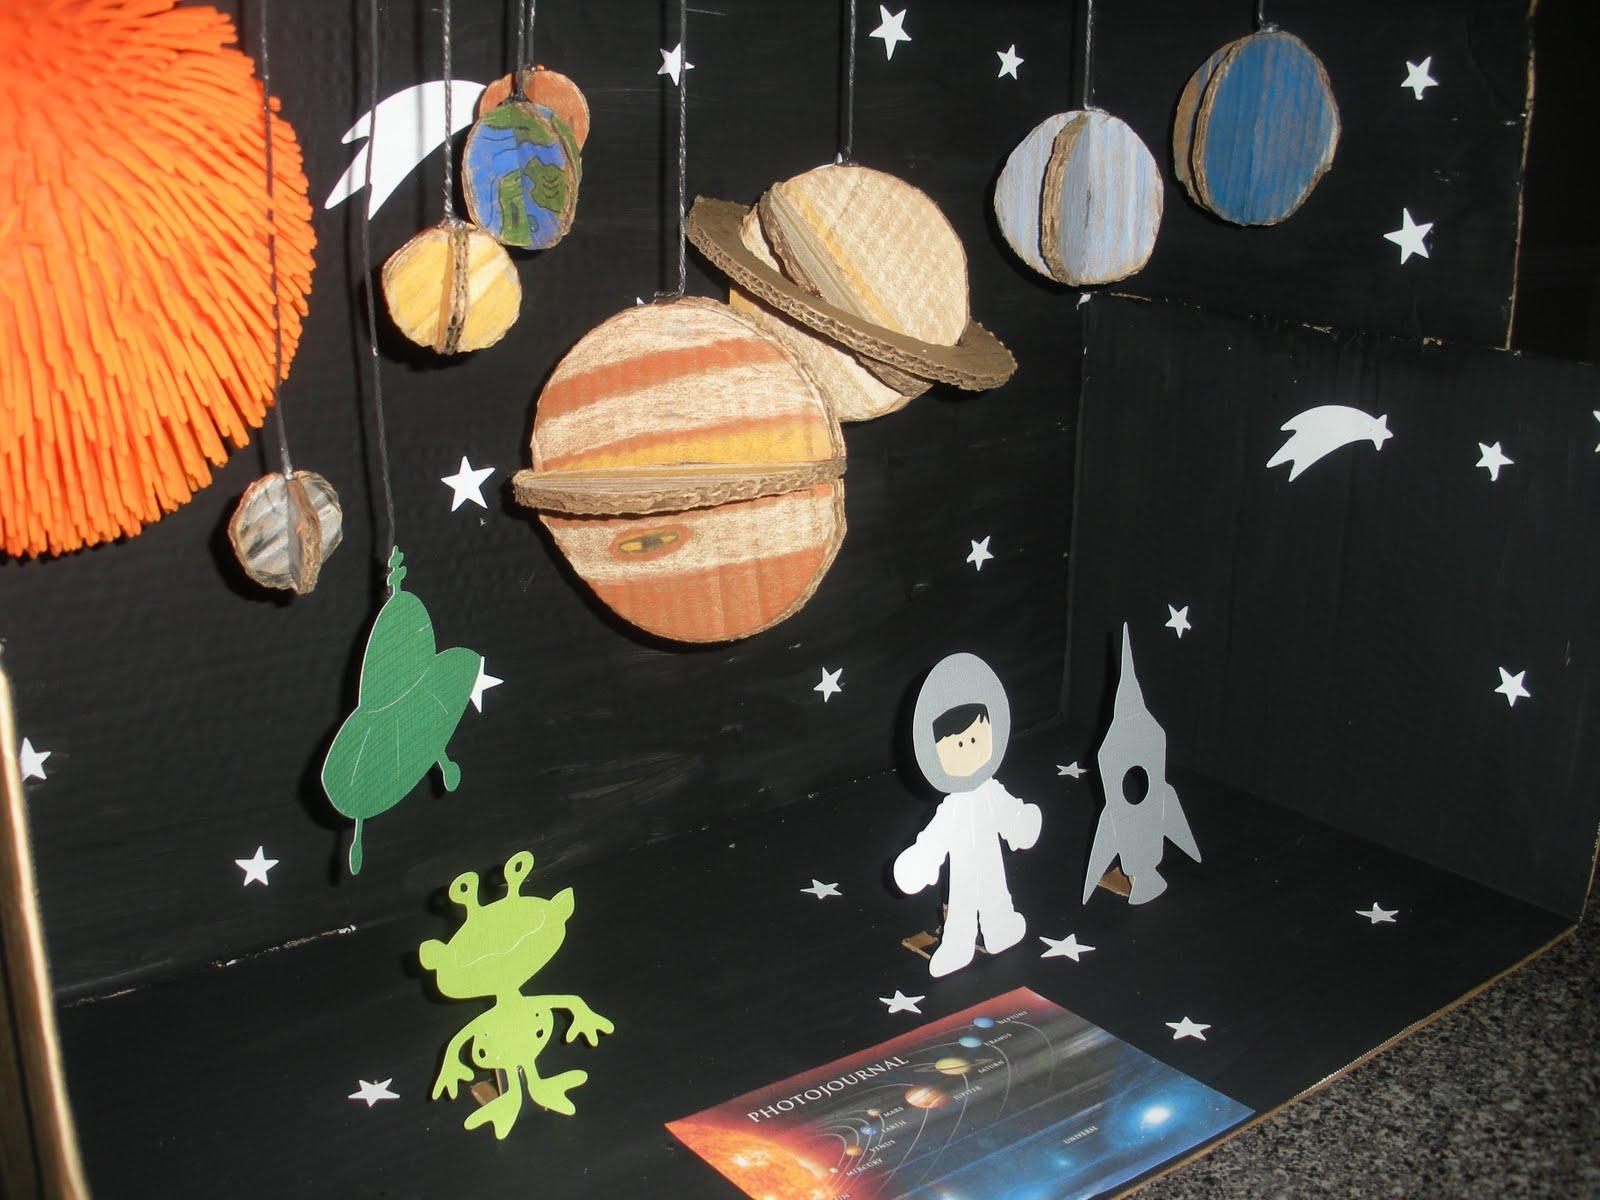 3d planets solar system shoebox - photo #49